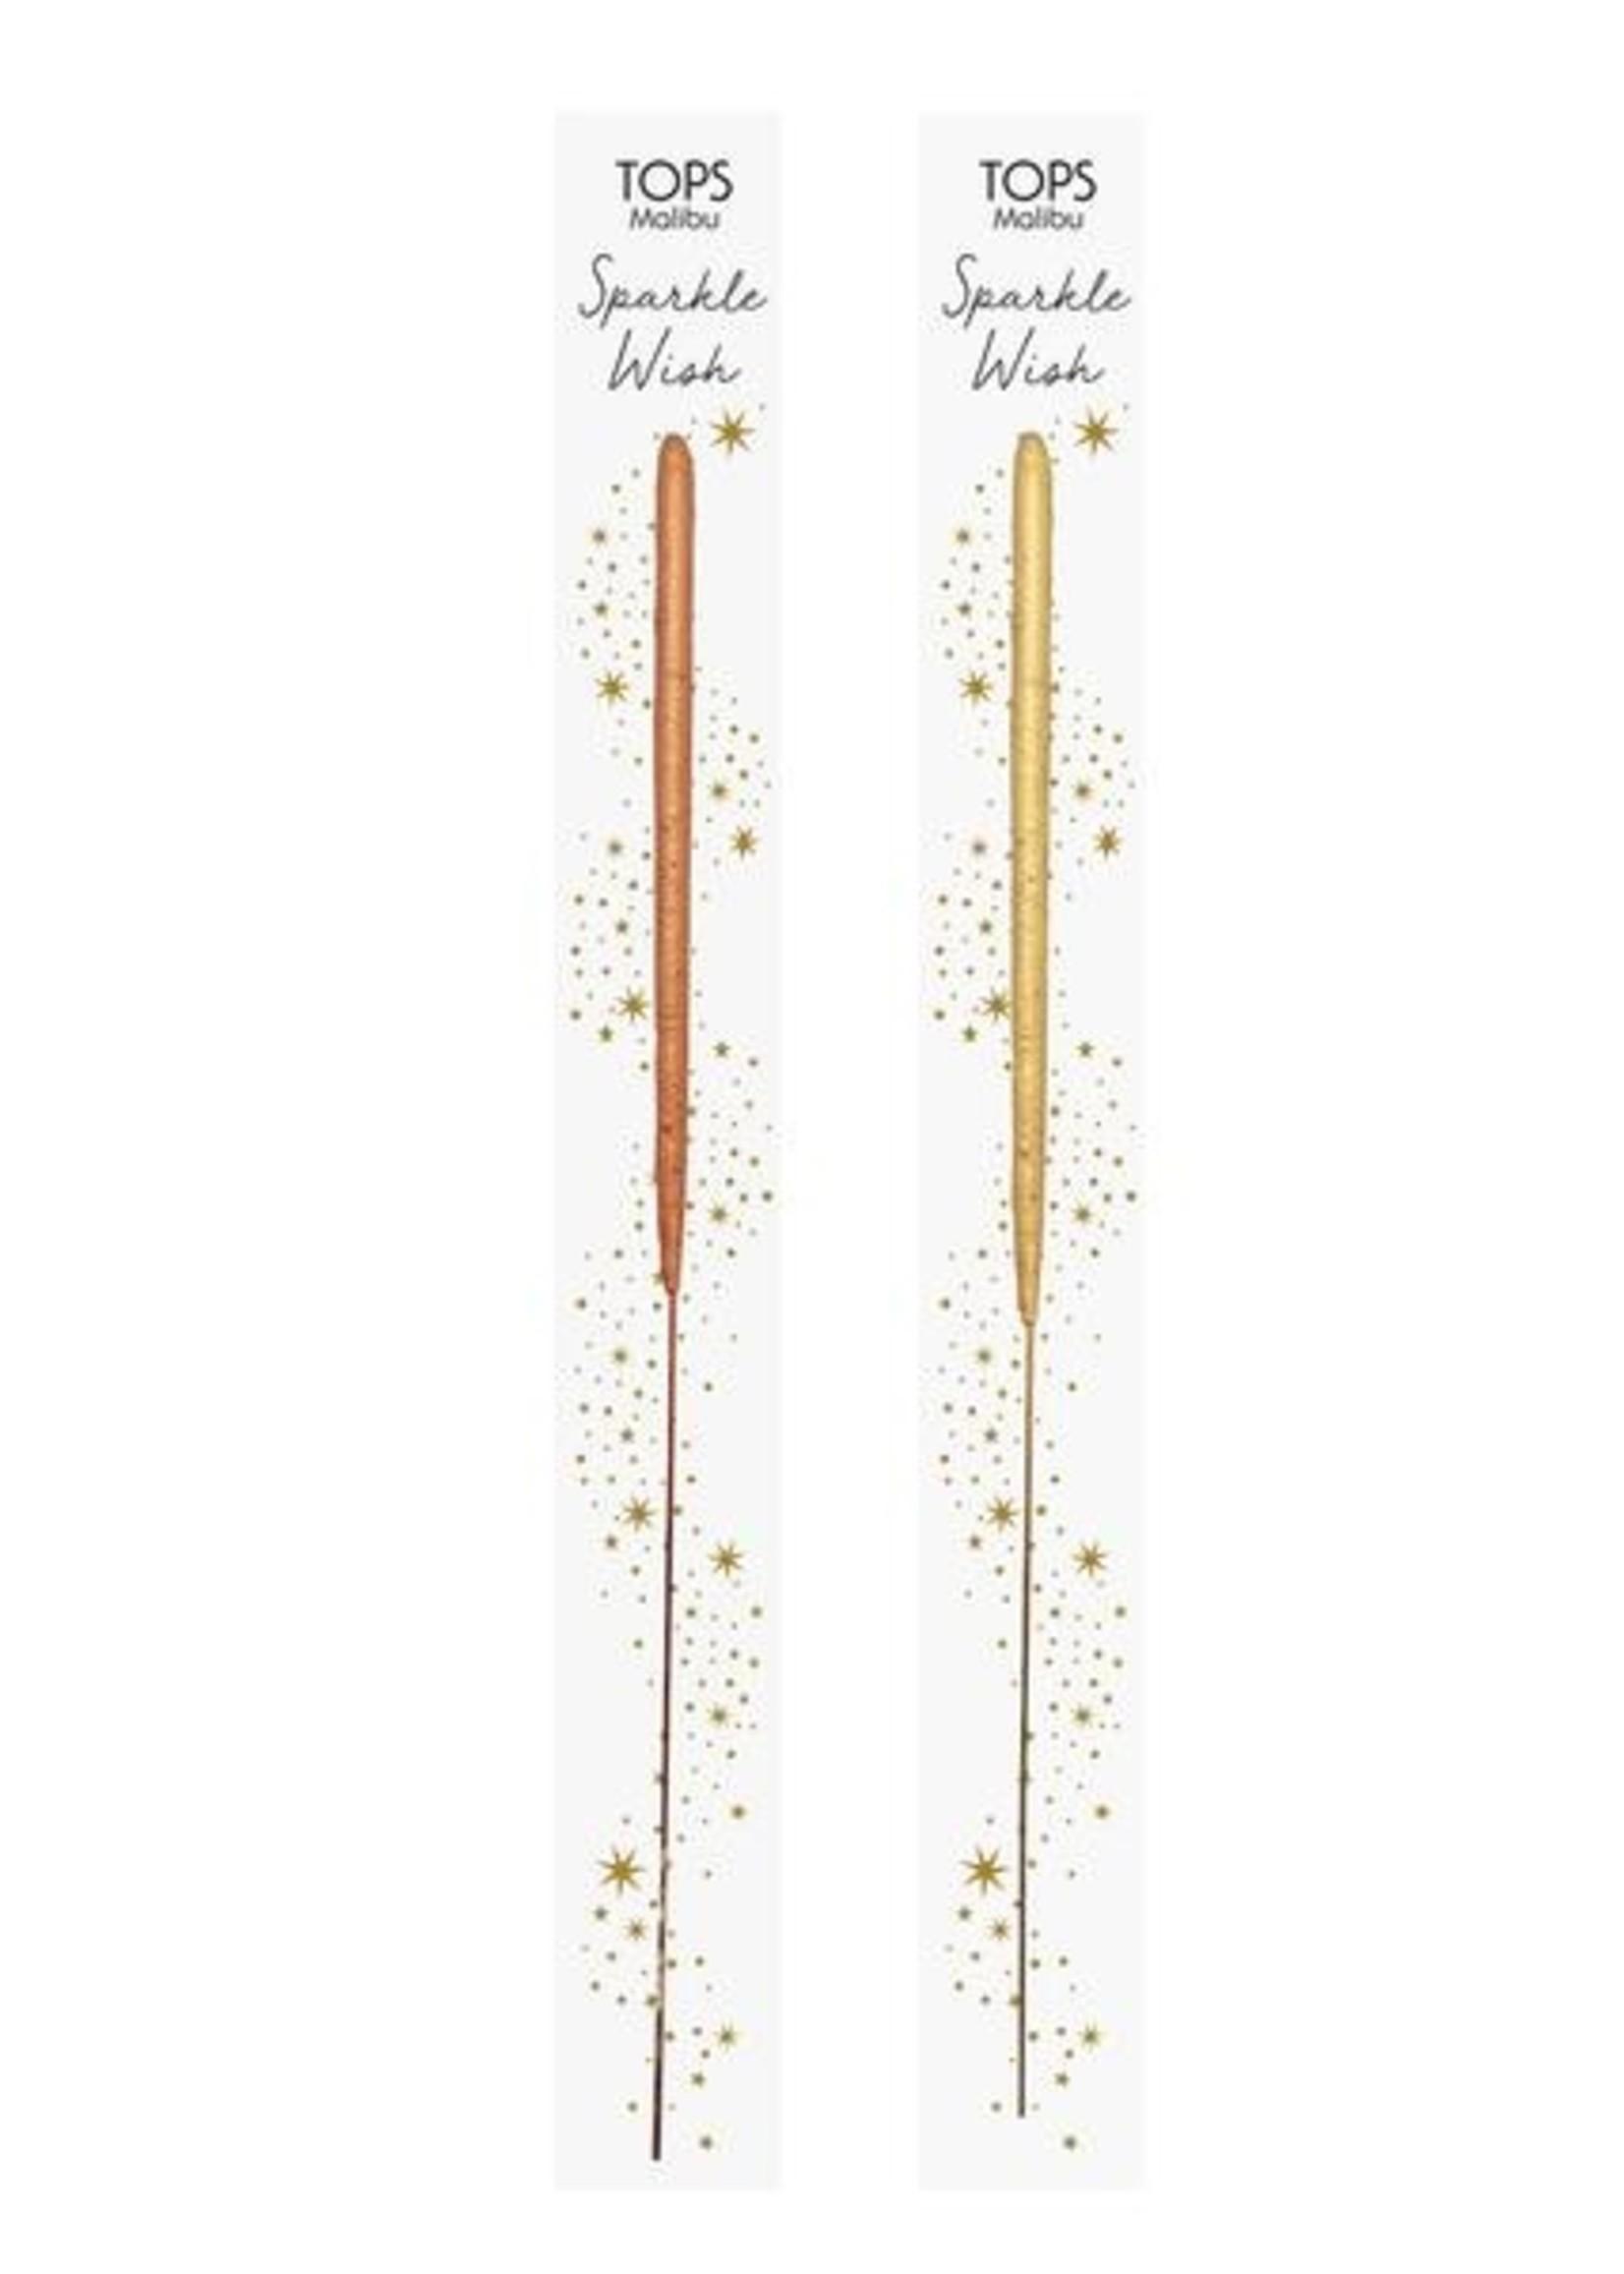 Tops Malibu Inc Single Wish Sparkler